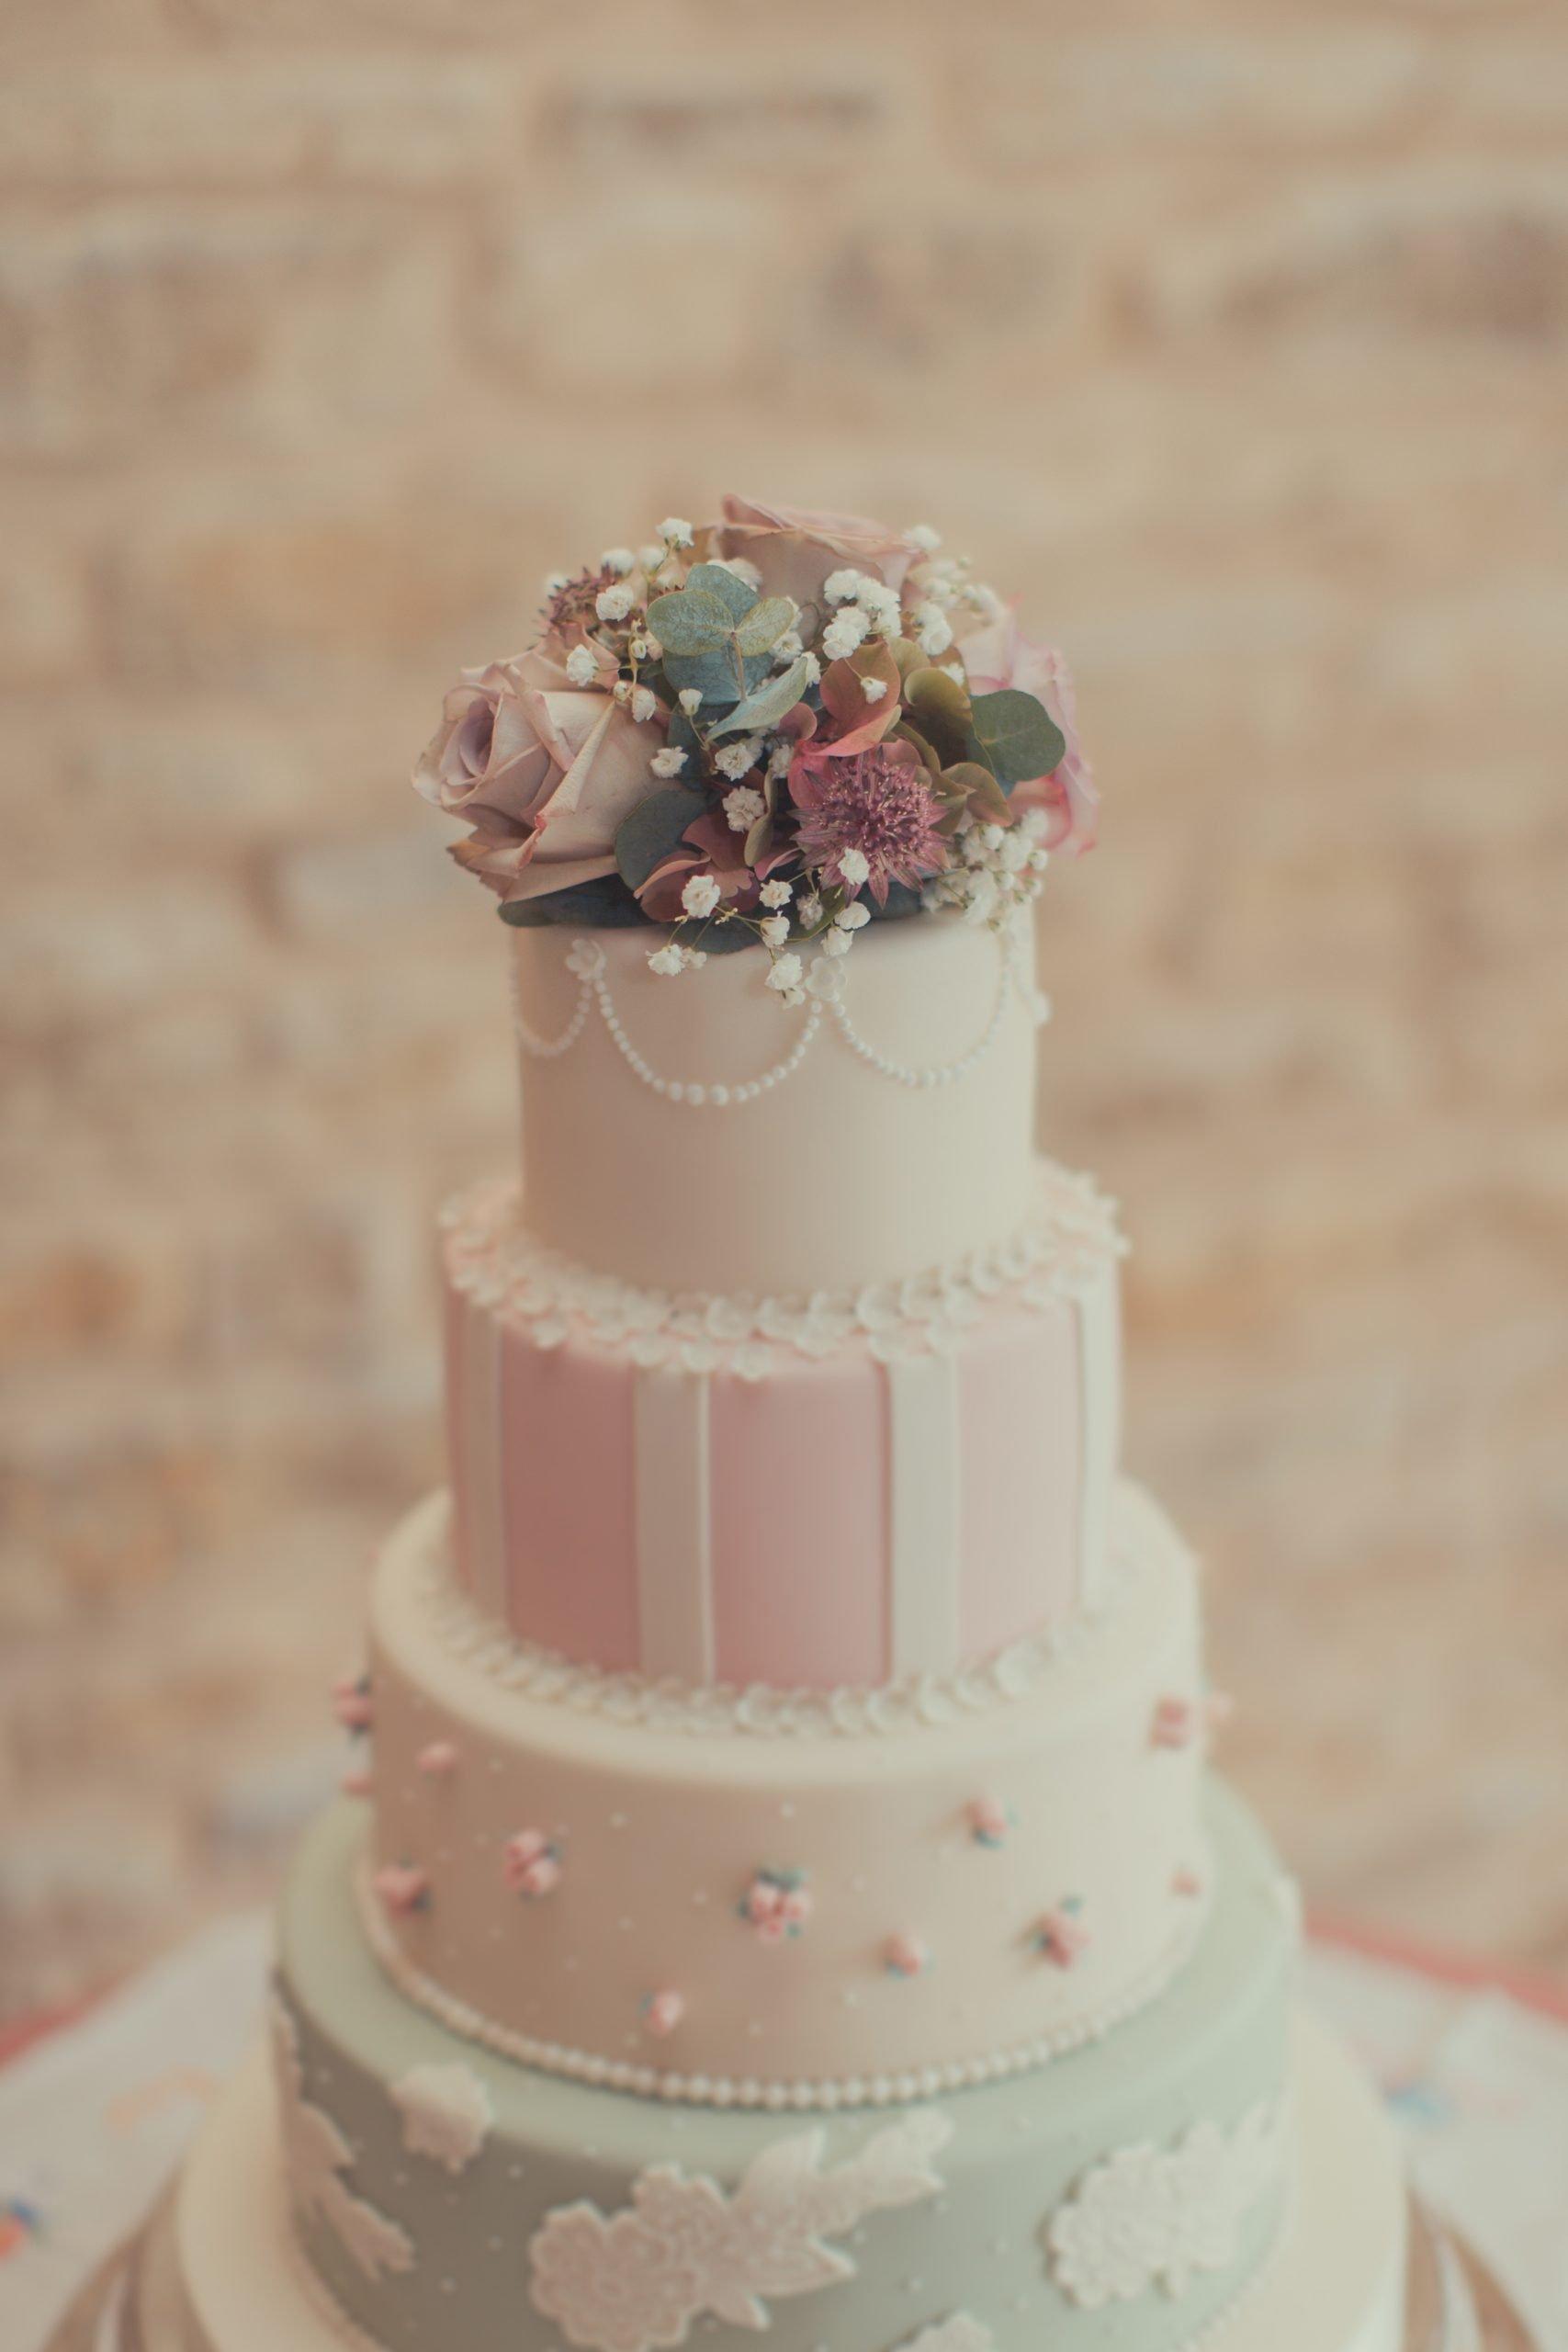 Wedding cake with vintage flower arrangement on top.dusky pinks